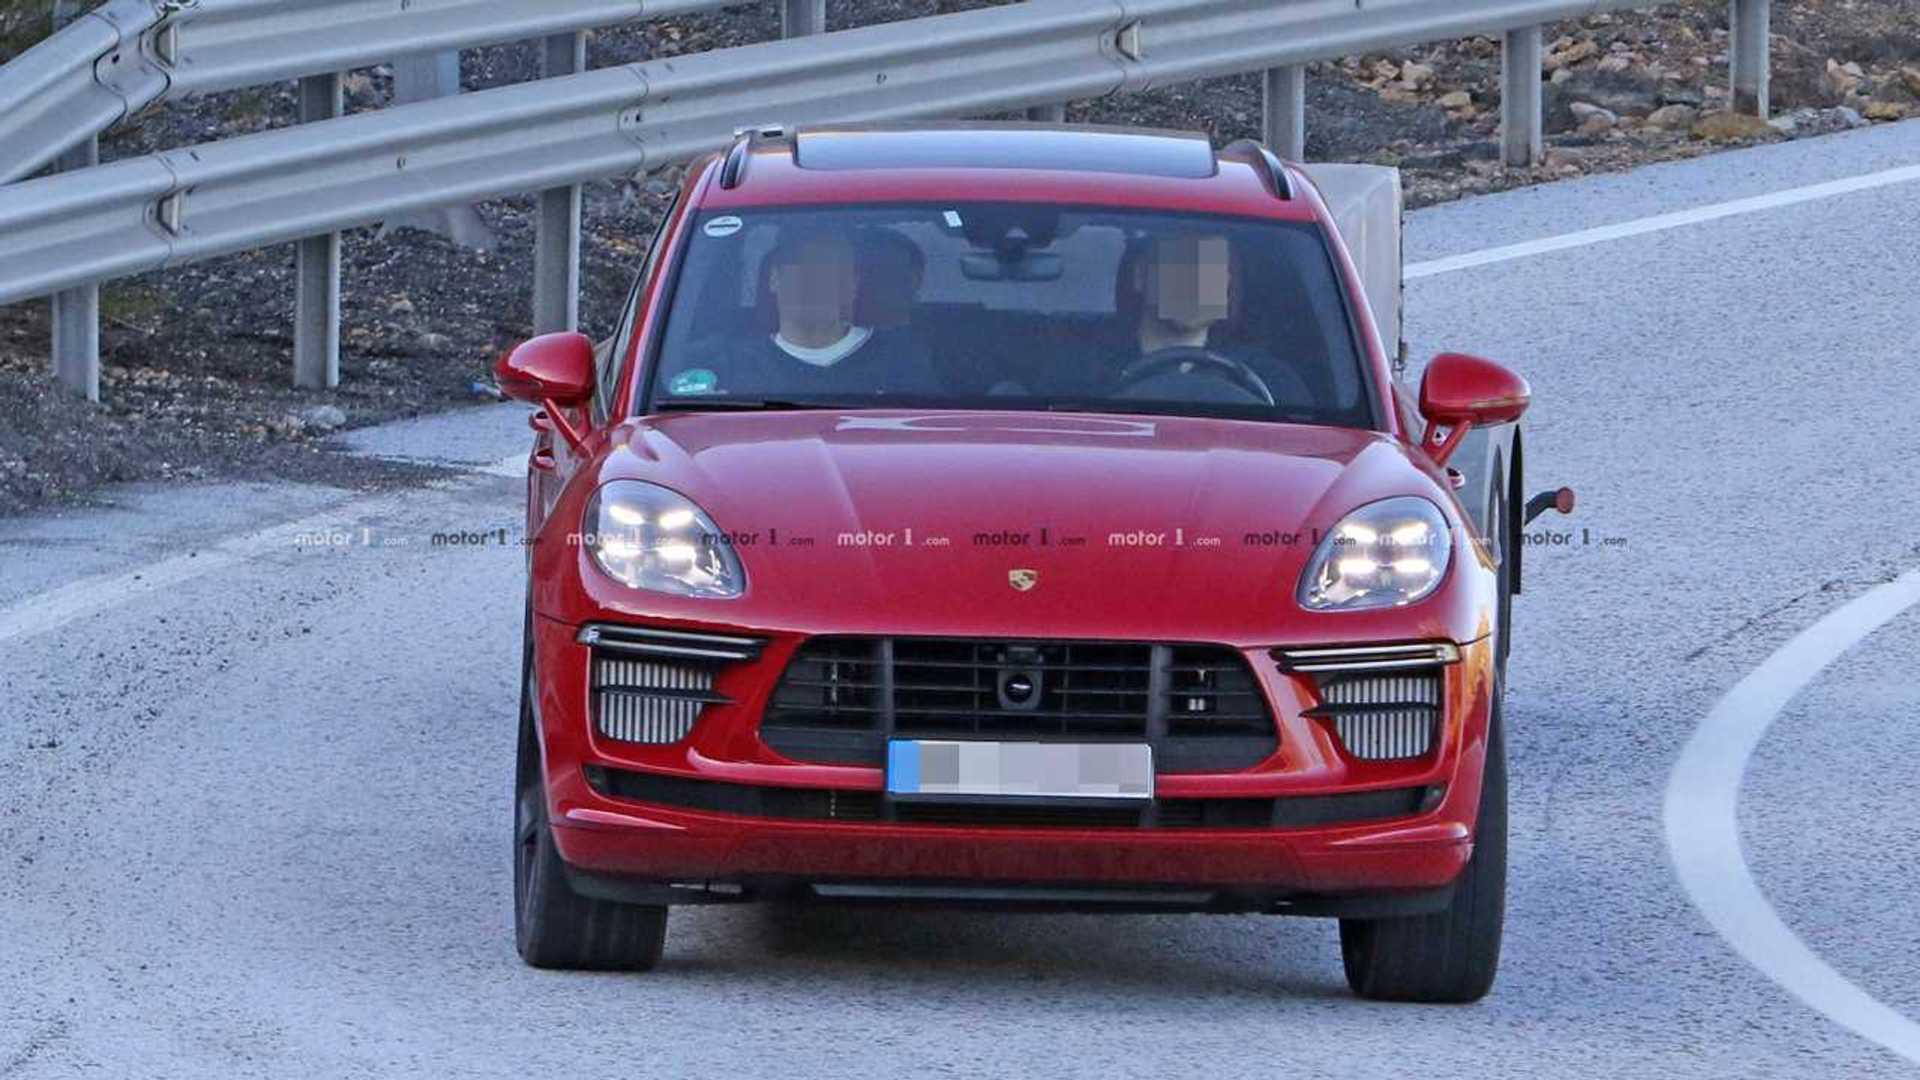 2018 - [Porsche] Macan Restylée [95B] - Page 4 Porsche-macan-turbo-spy-shots